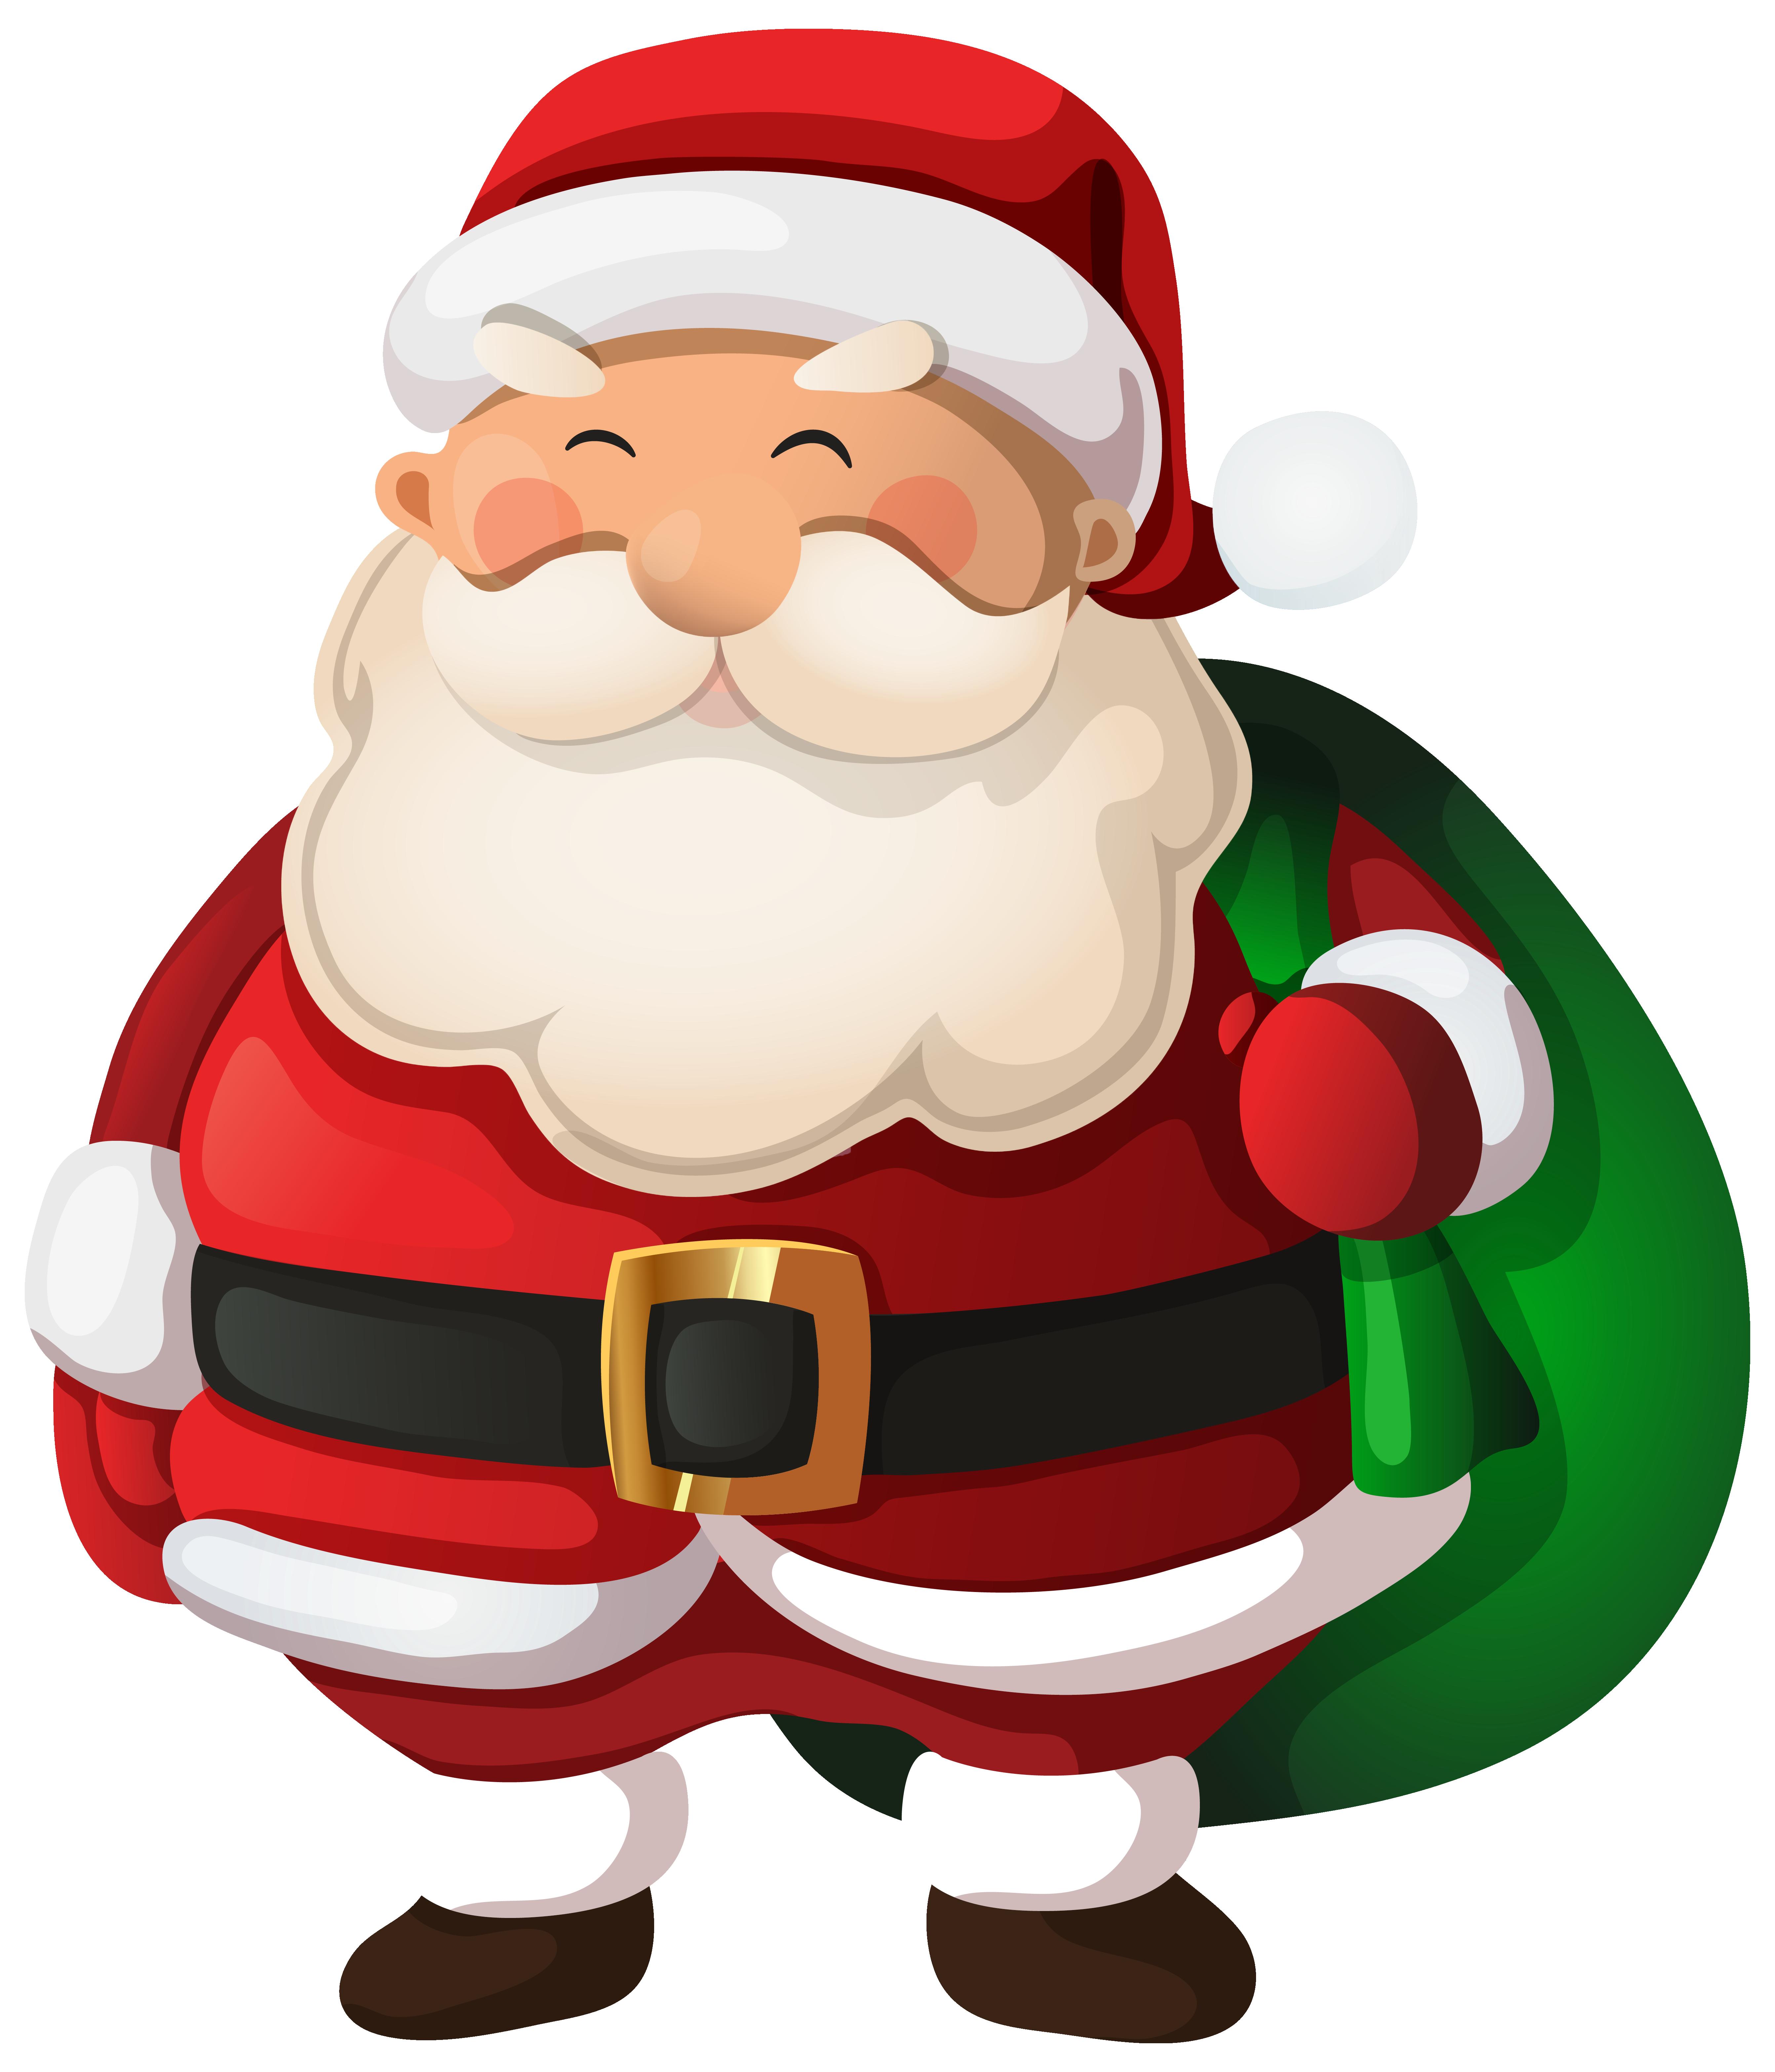 santa claus clipart at getdrawings com free for personal use santa rh getdrawings com santa claus clipart png santa claus clip art black and white